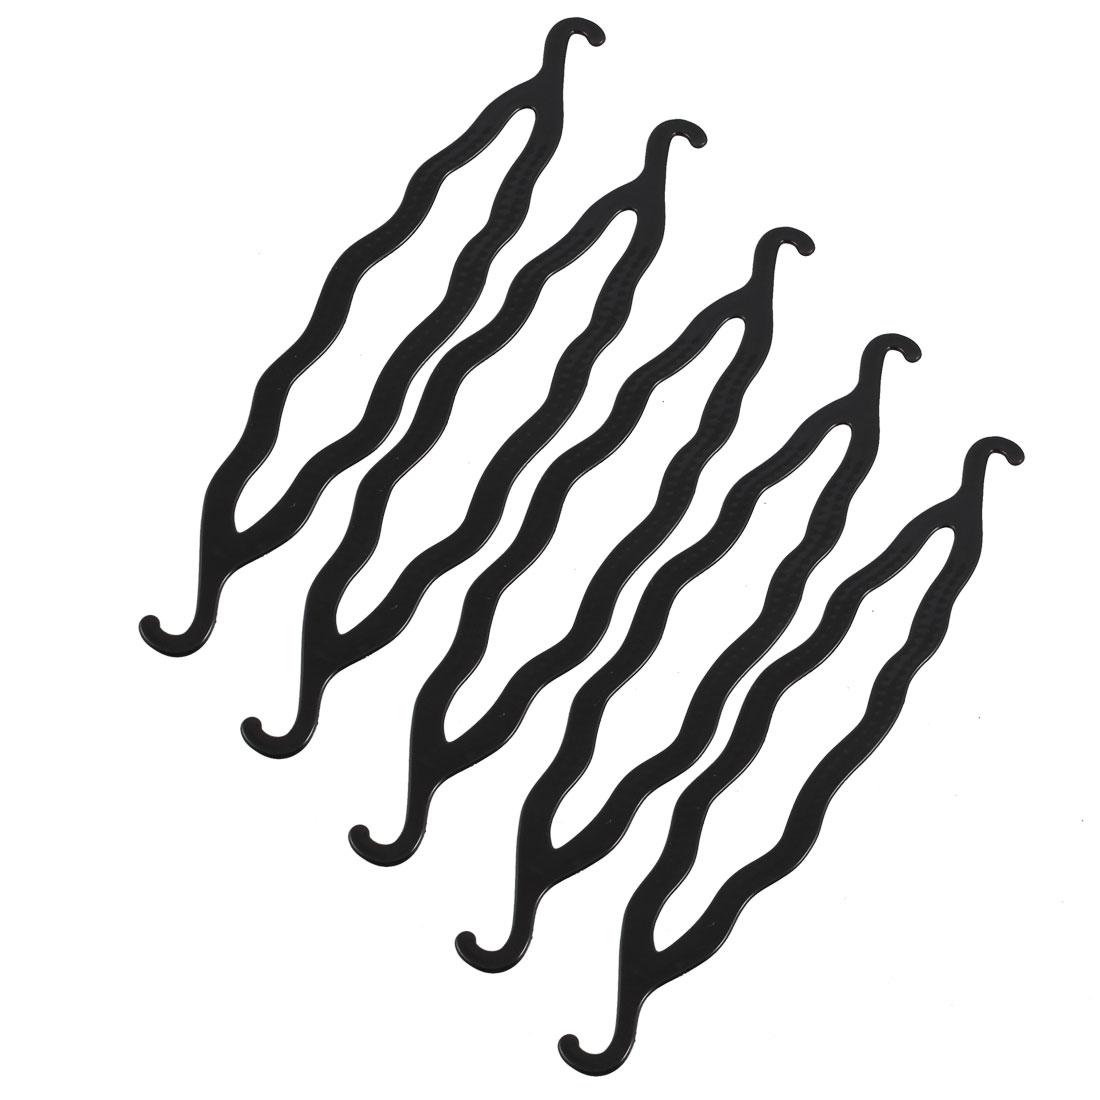 Lady Women Plastic Bun Maker Curler Hair Holder Twist Clip Roll Braid Tool Black